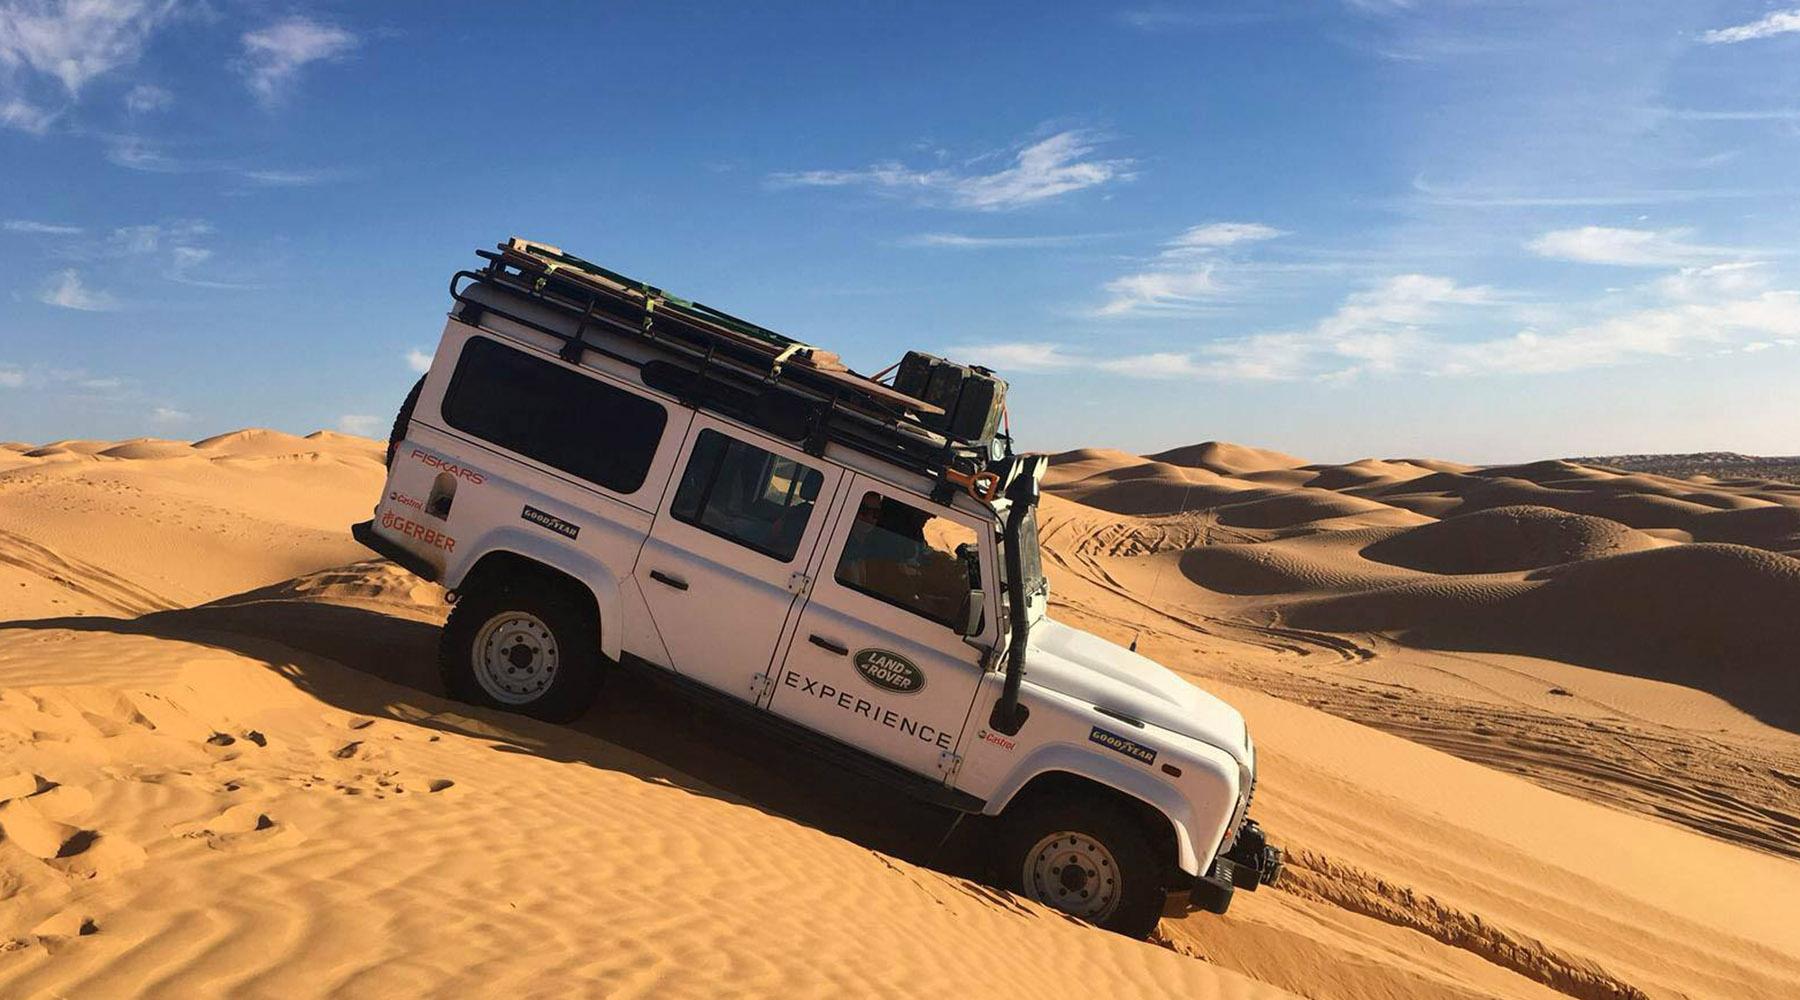 Tunisia Land Rover Experience Italia